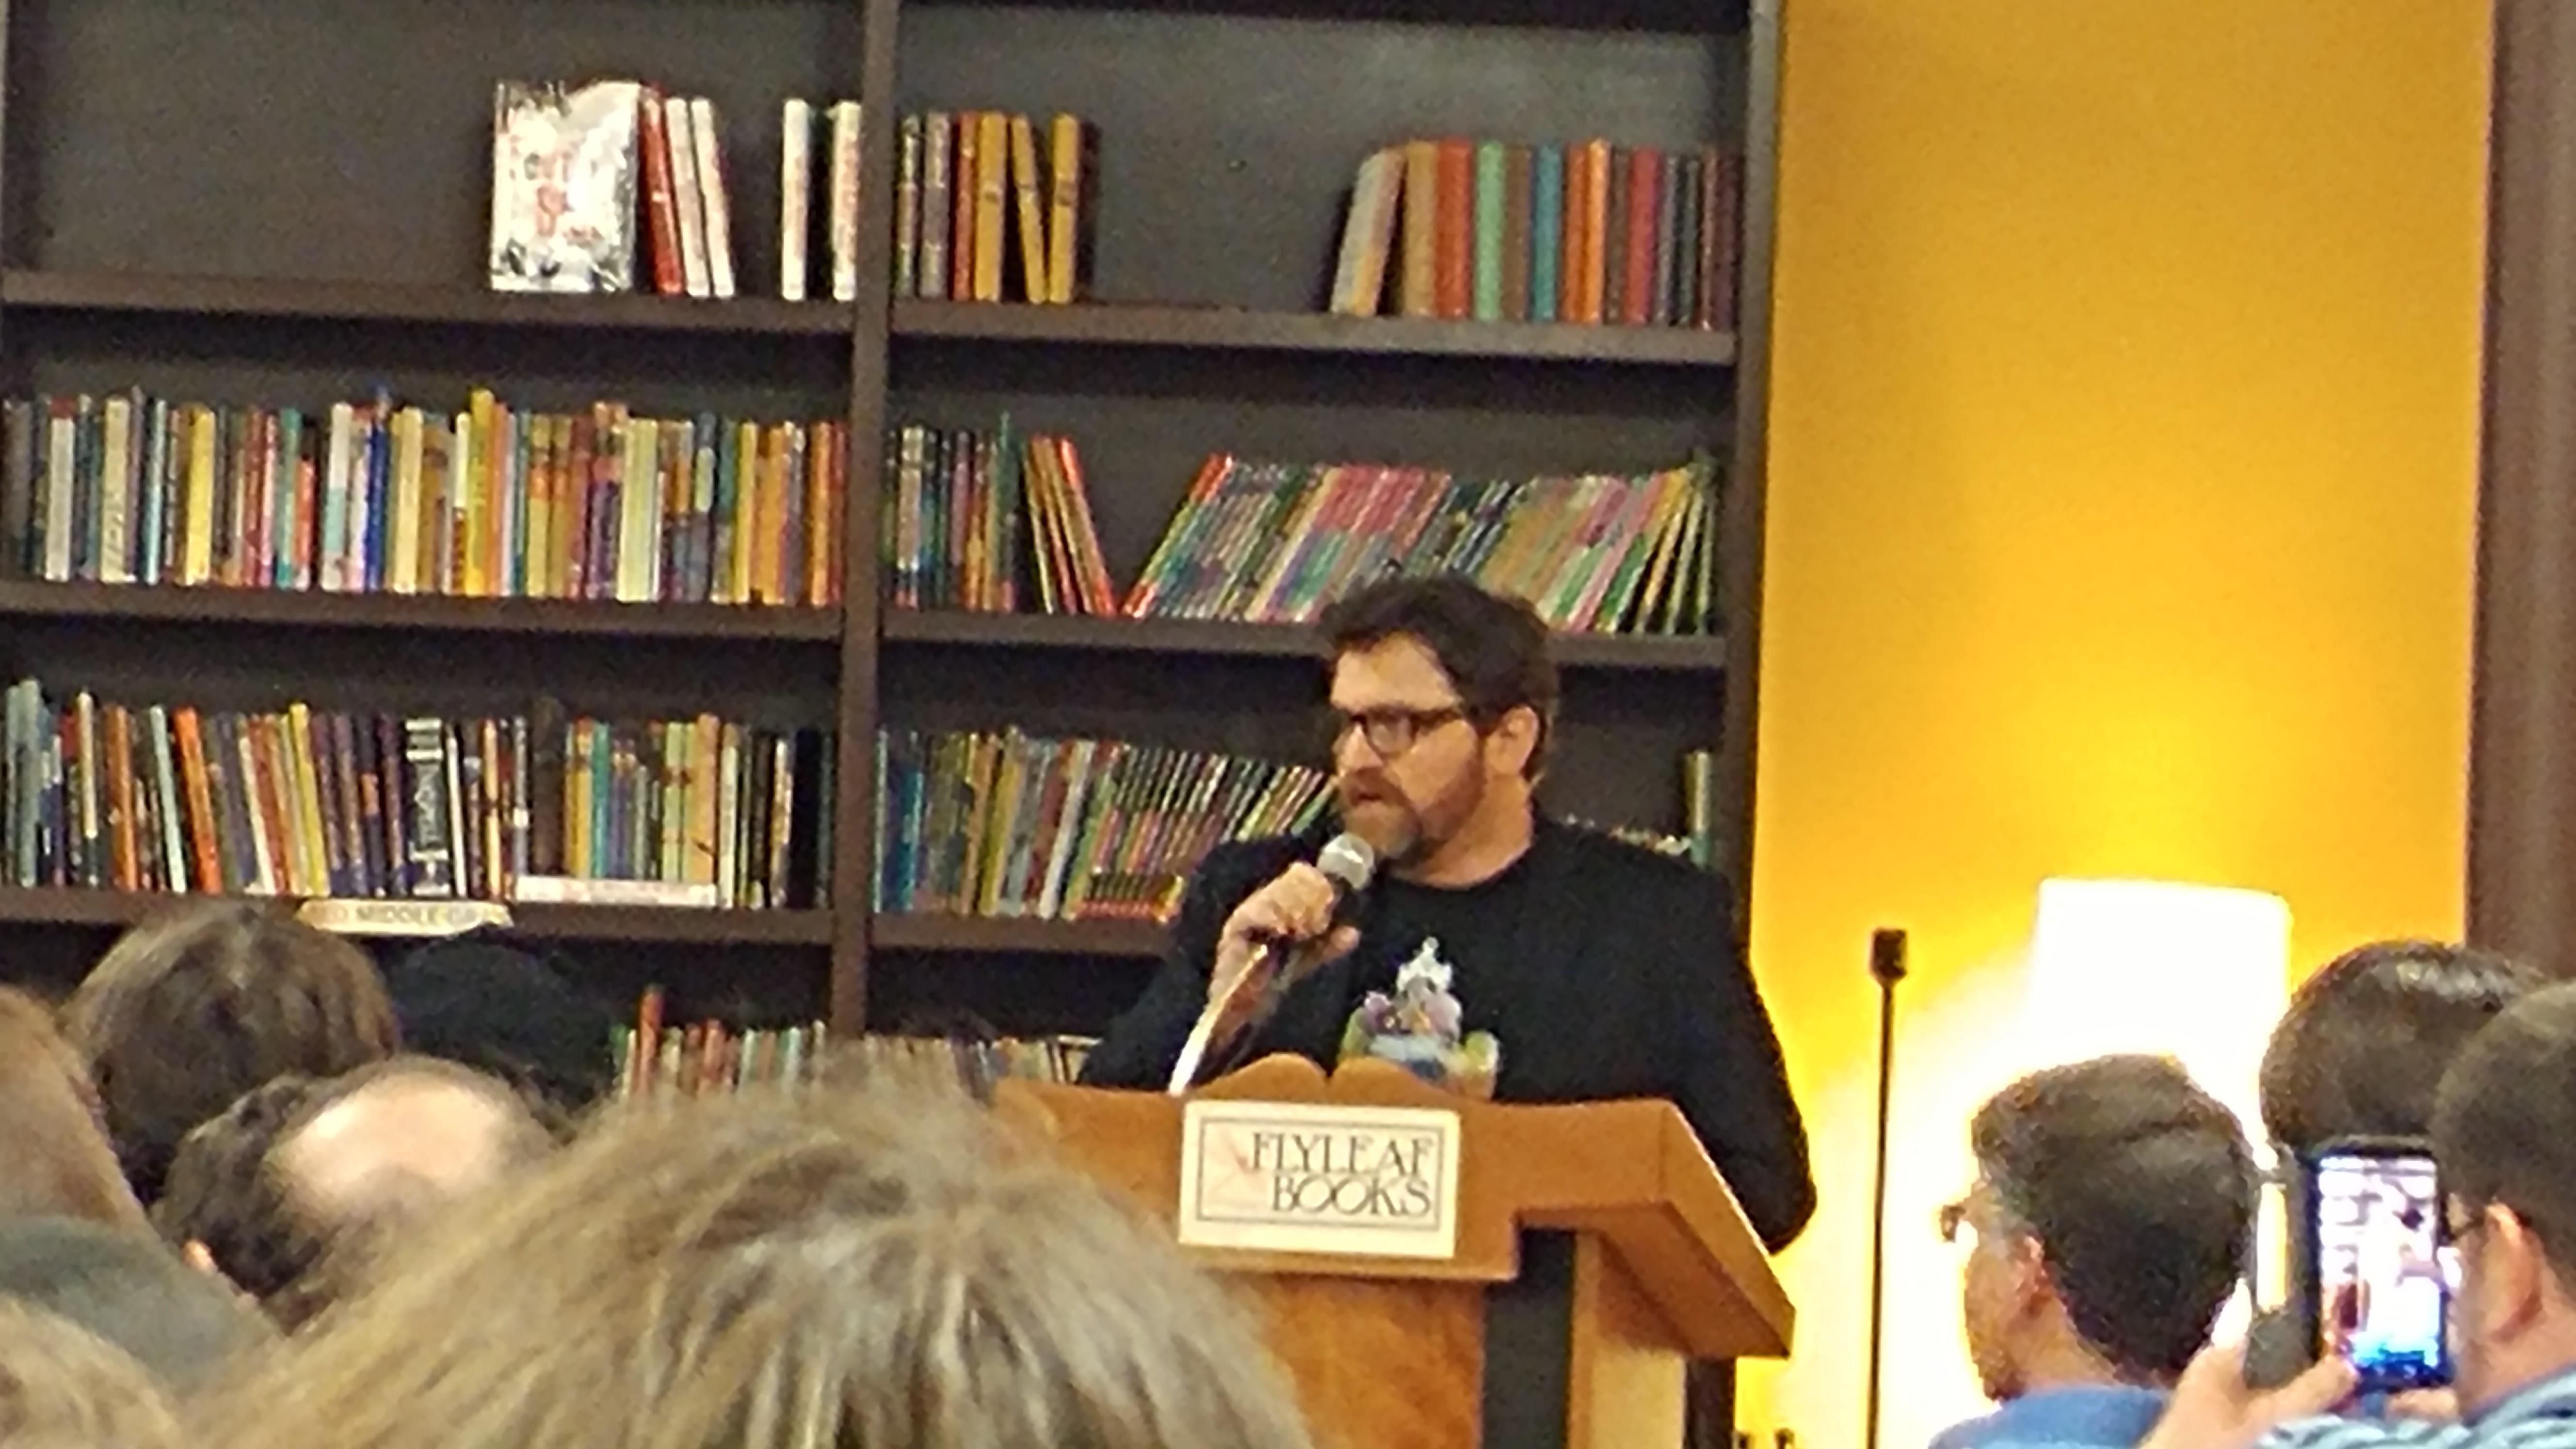 Ernie Cline's Armada and a Talk at Flyleaf Books, Chapel Hill